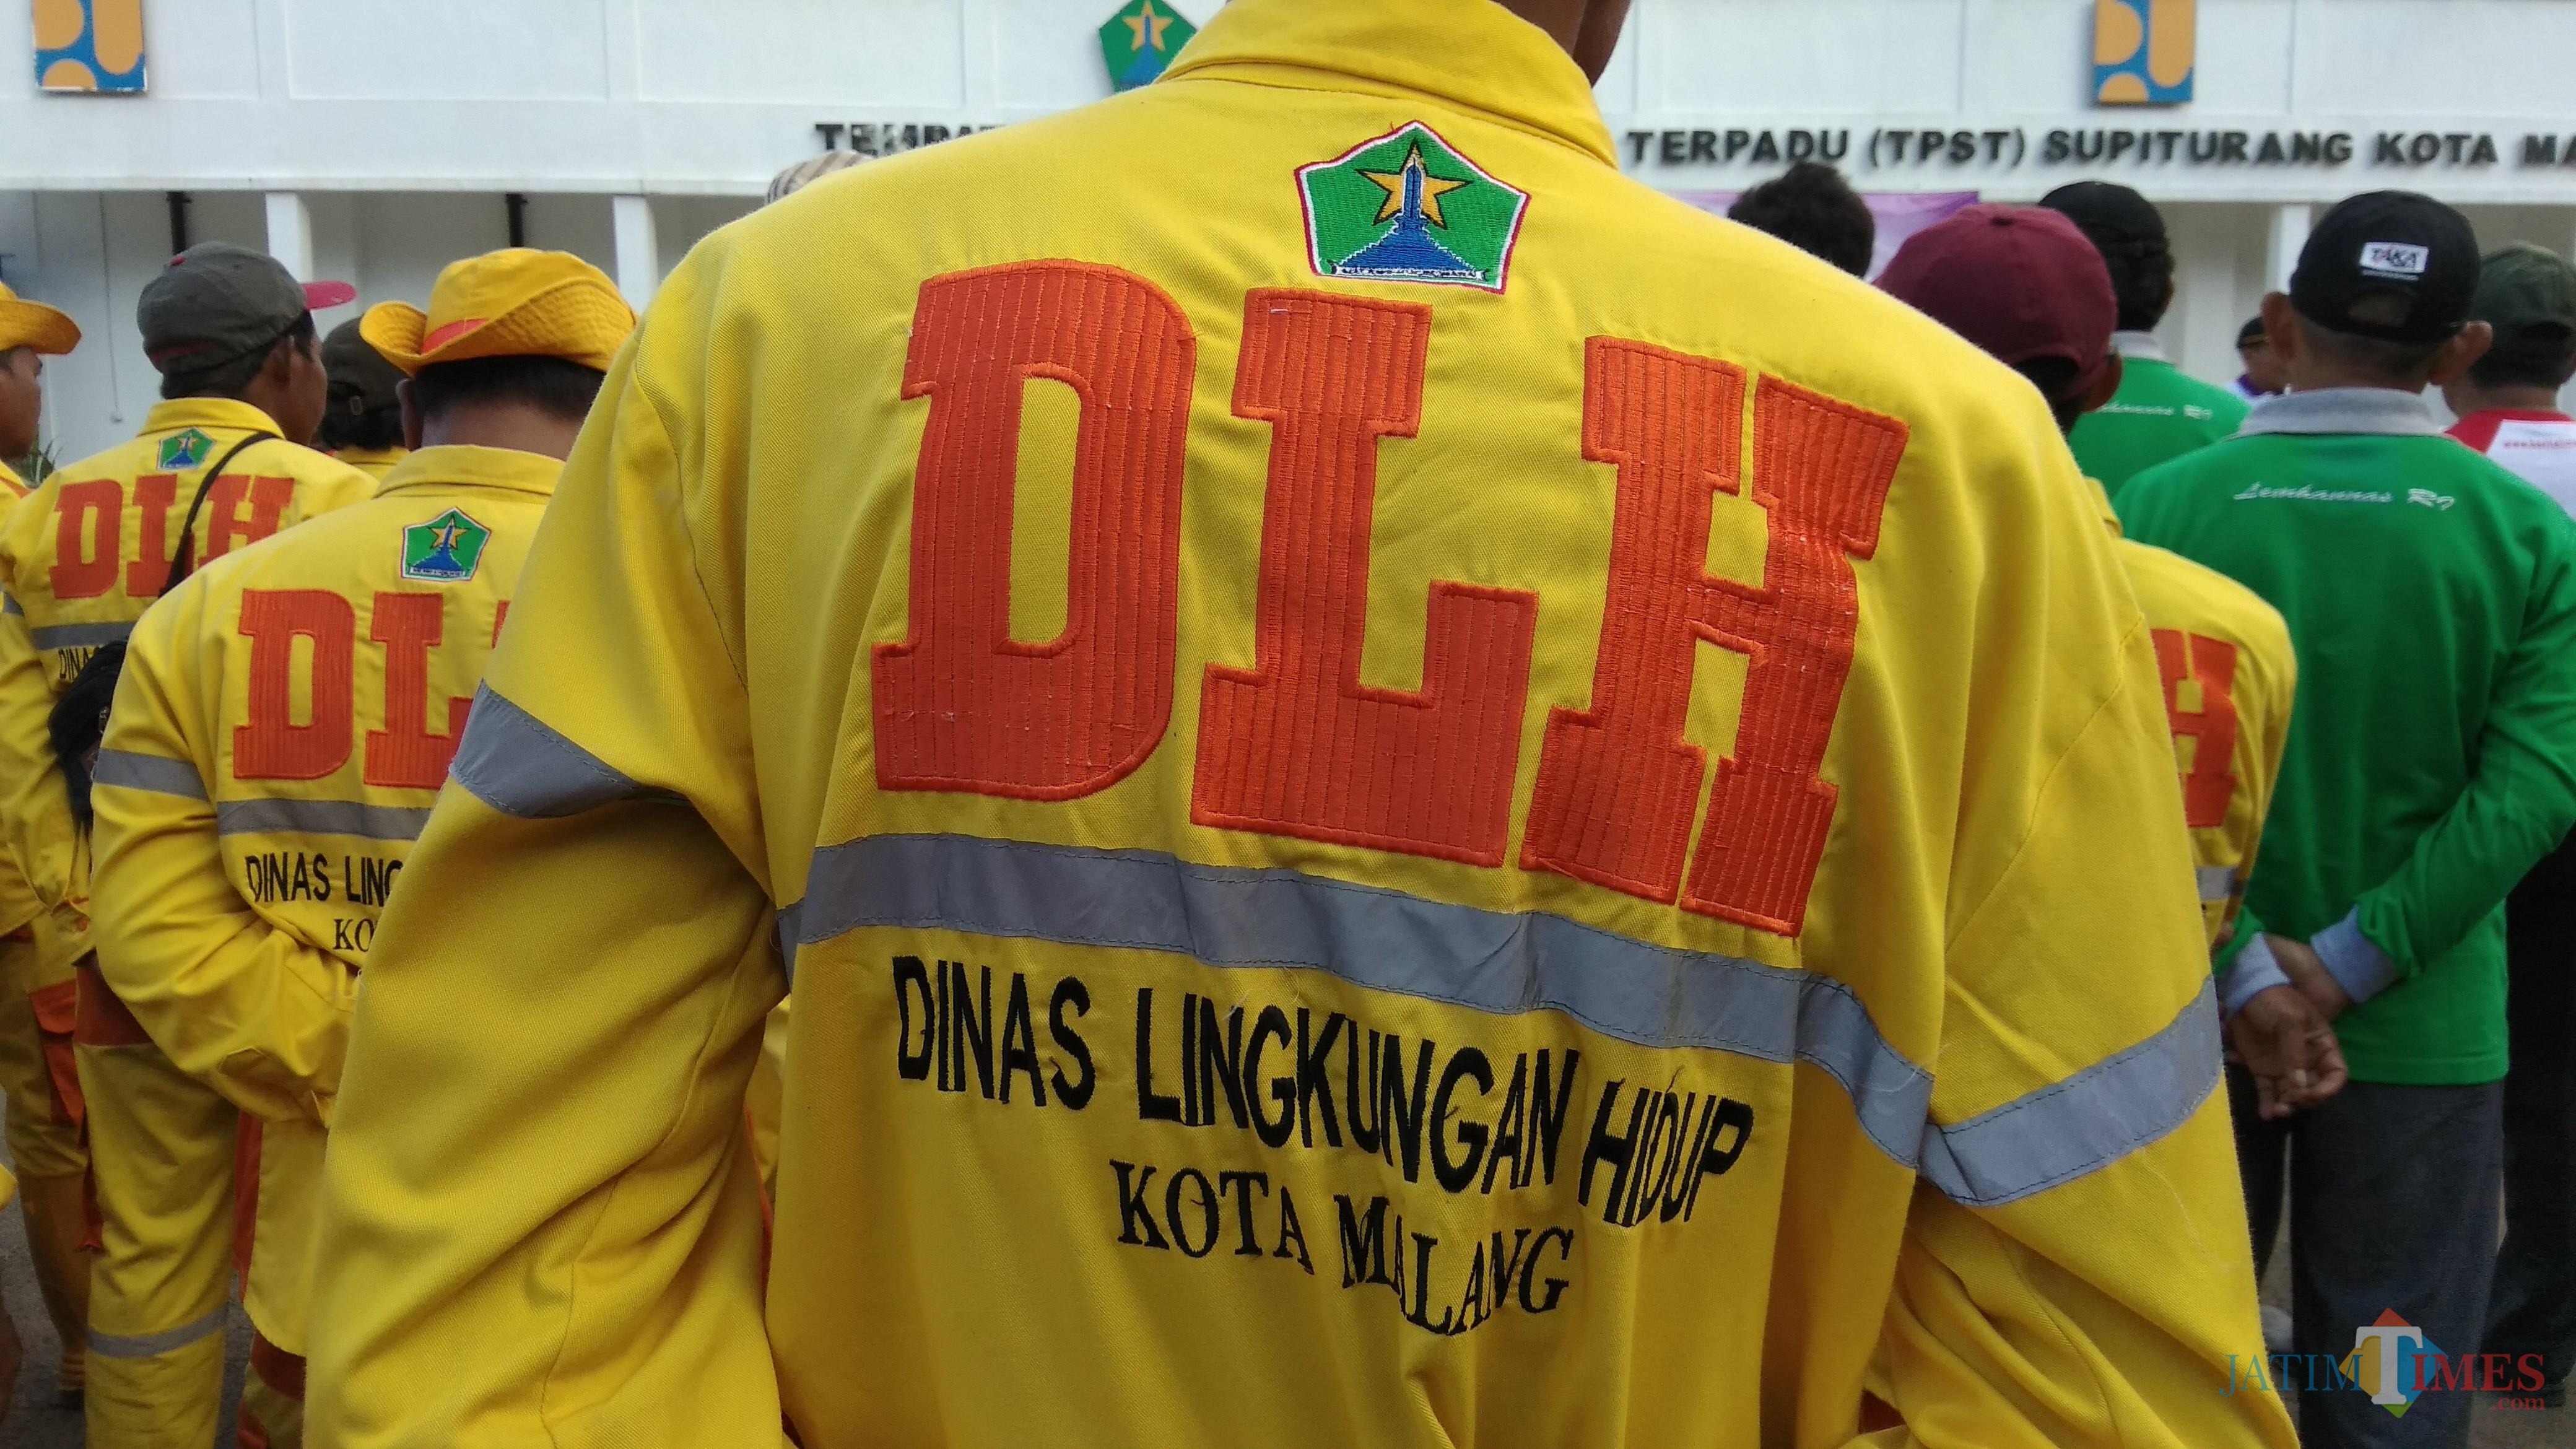 Para pasukan kuning atau petugas dari DLH Kota Malang yang bertugas membersihkan sampah harian masyarakat. (Foto: Nurlayla Ratri/MalangTIMES)